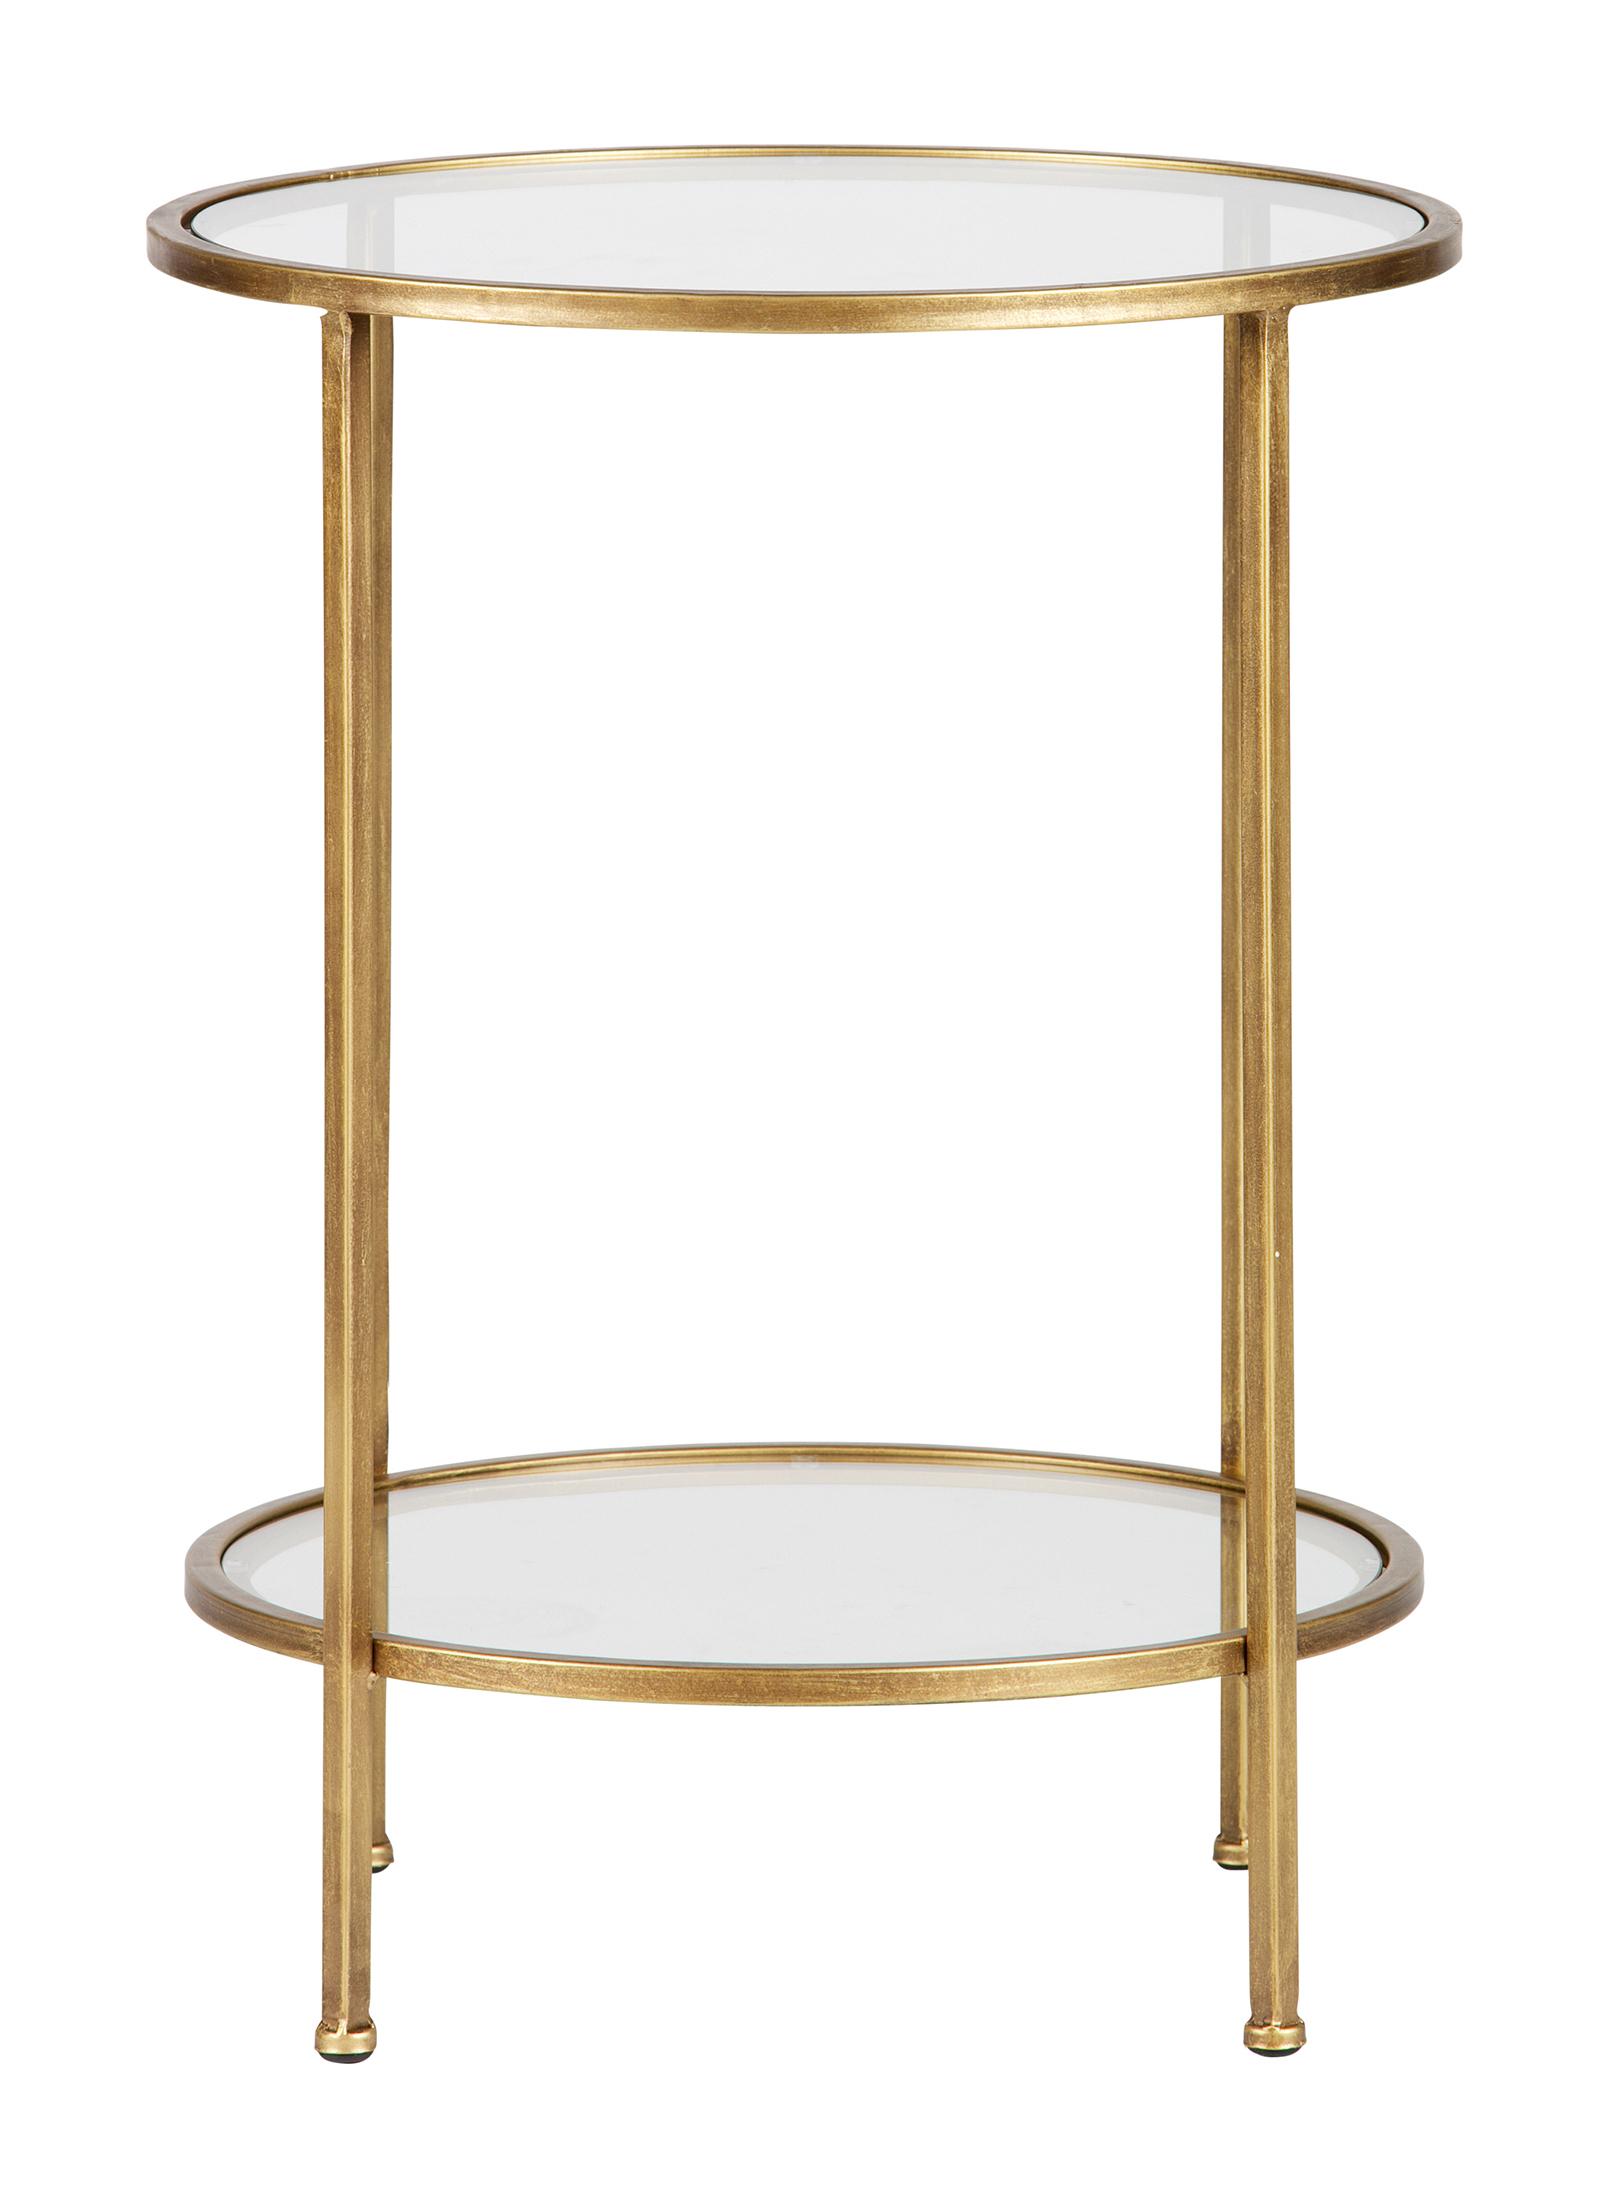 BePureHome Bijzettafel 'Goddess' 45,5cm, kleur Antique Brass Tafels | Bijzettafels kopen